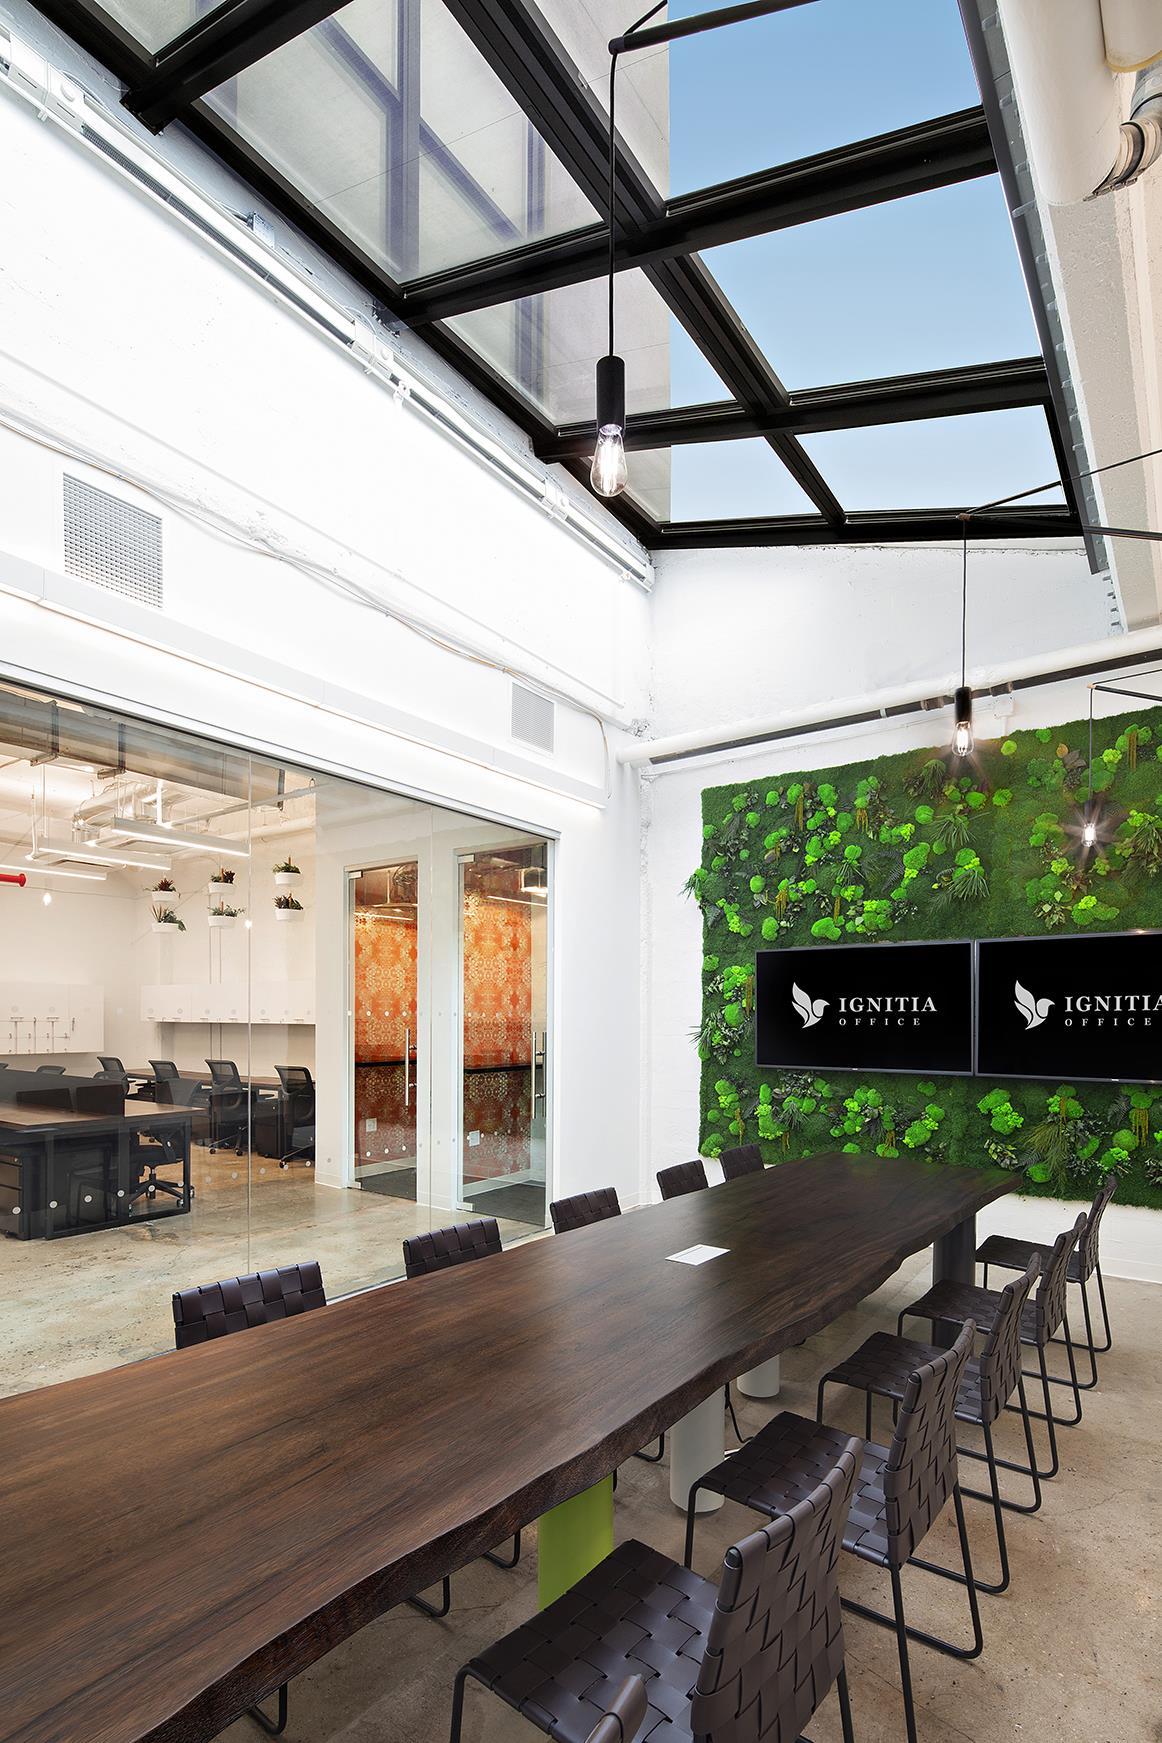 Ignitia Office - The Boardroom